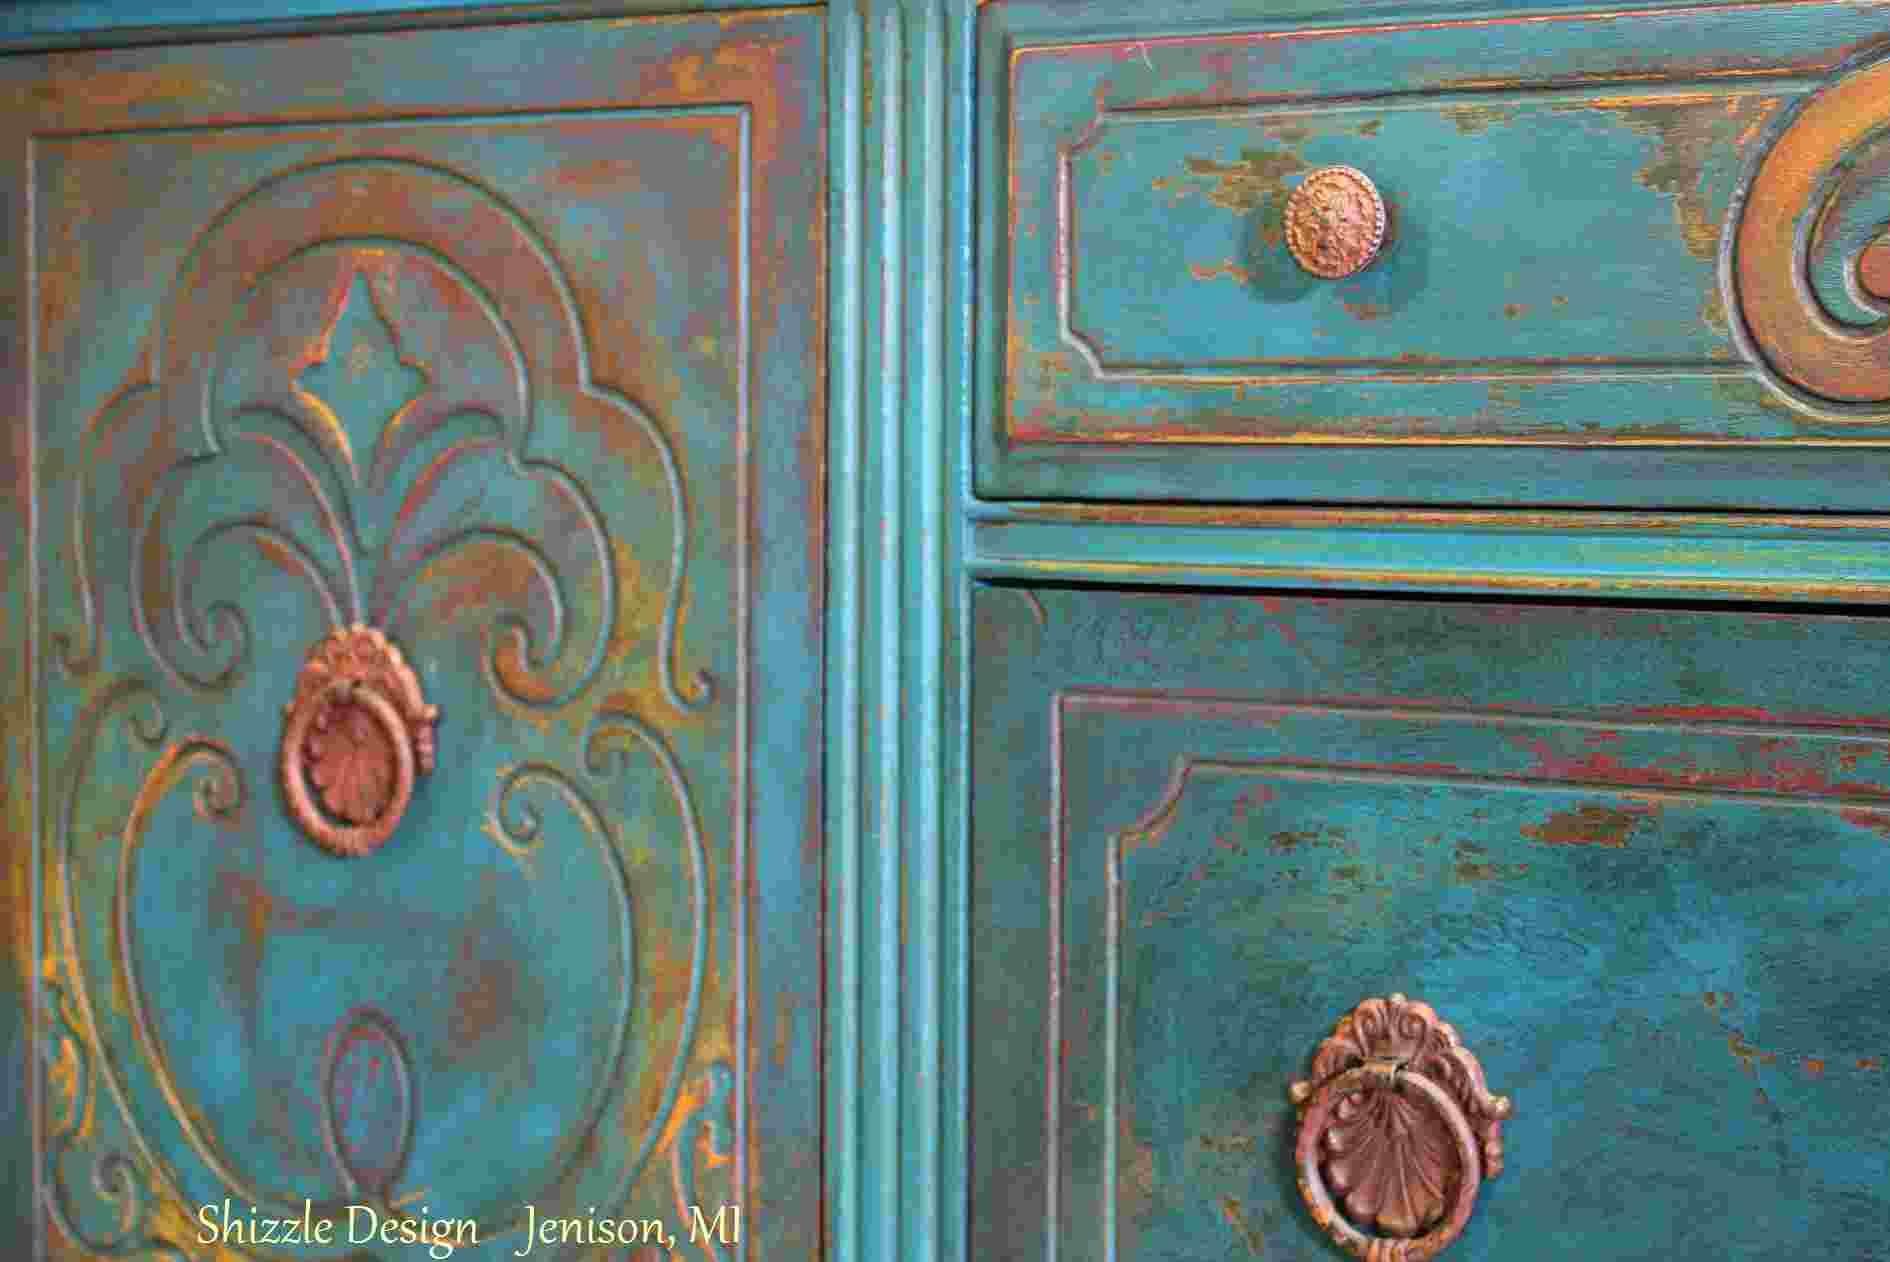 American Paint Companyu0027s Peacock Hand Painted Antique Buffet Shizzle Design  2018 Chicago Drive Jenison MI 49428